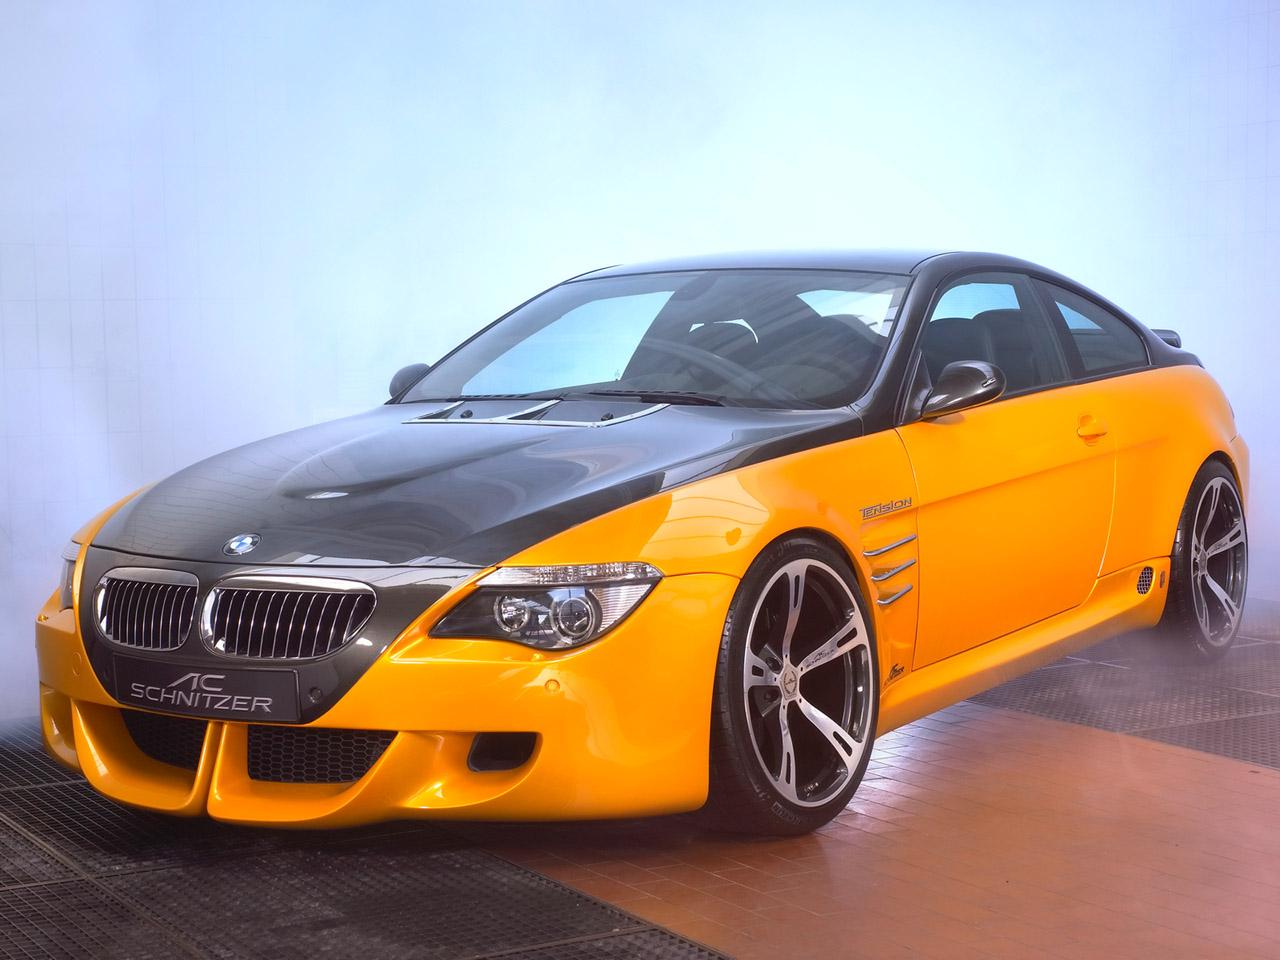 Free Desktop Wallpapers | Backgrounds: BMW Car Wallpapers, Car ...